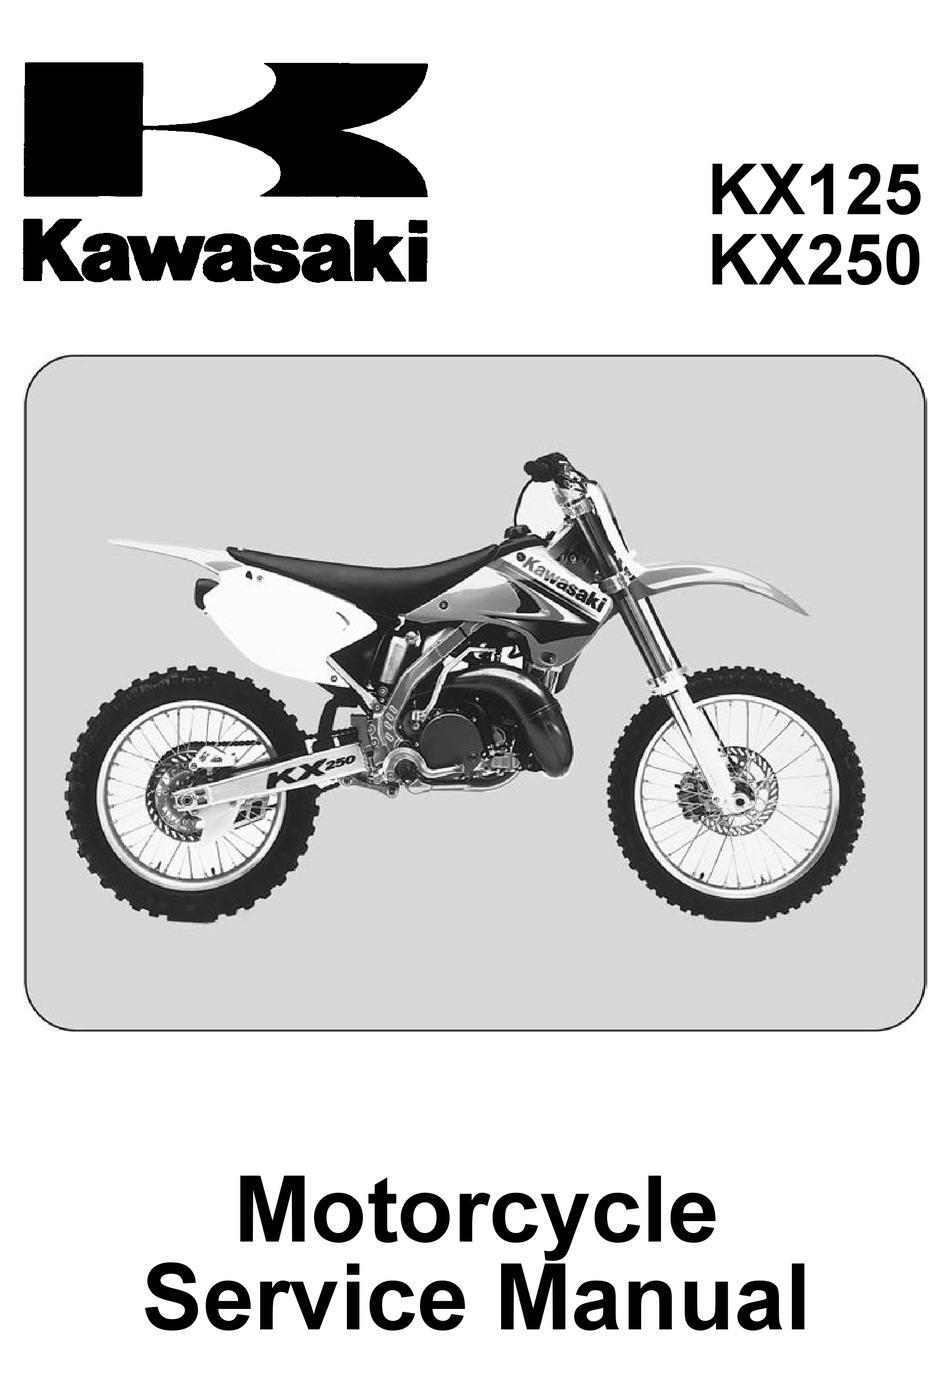 Kawasaki Kx125 Service Manual Pdf Download Manualslib